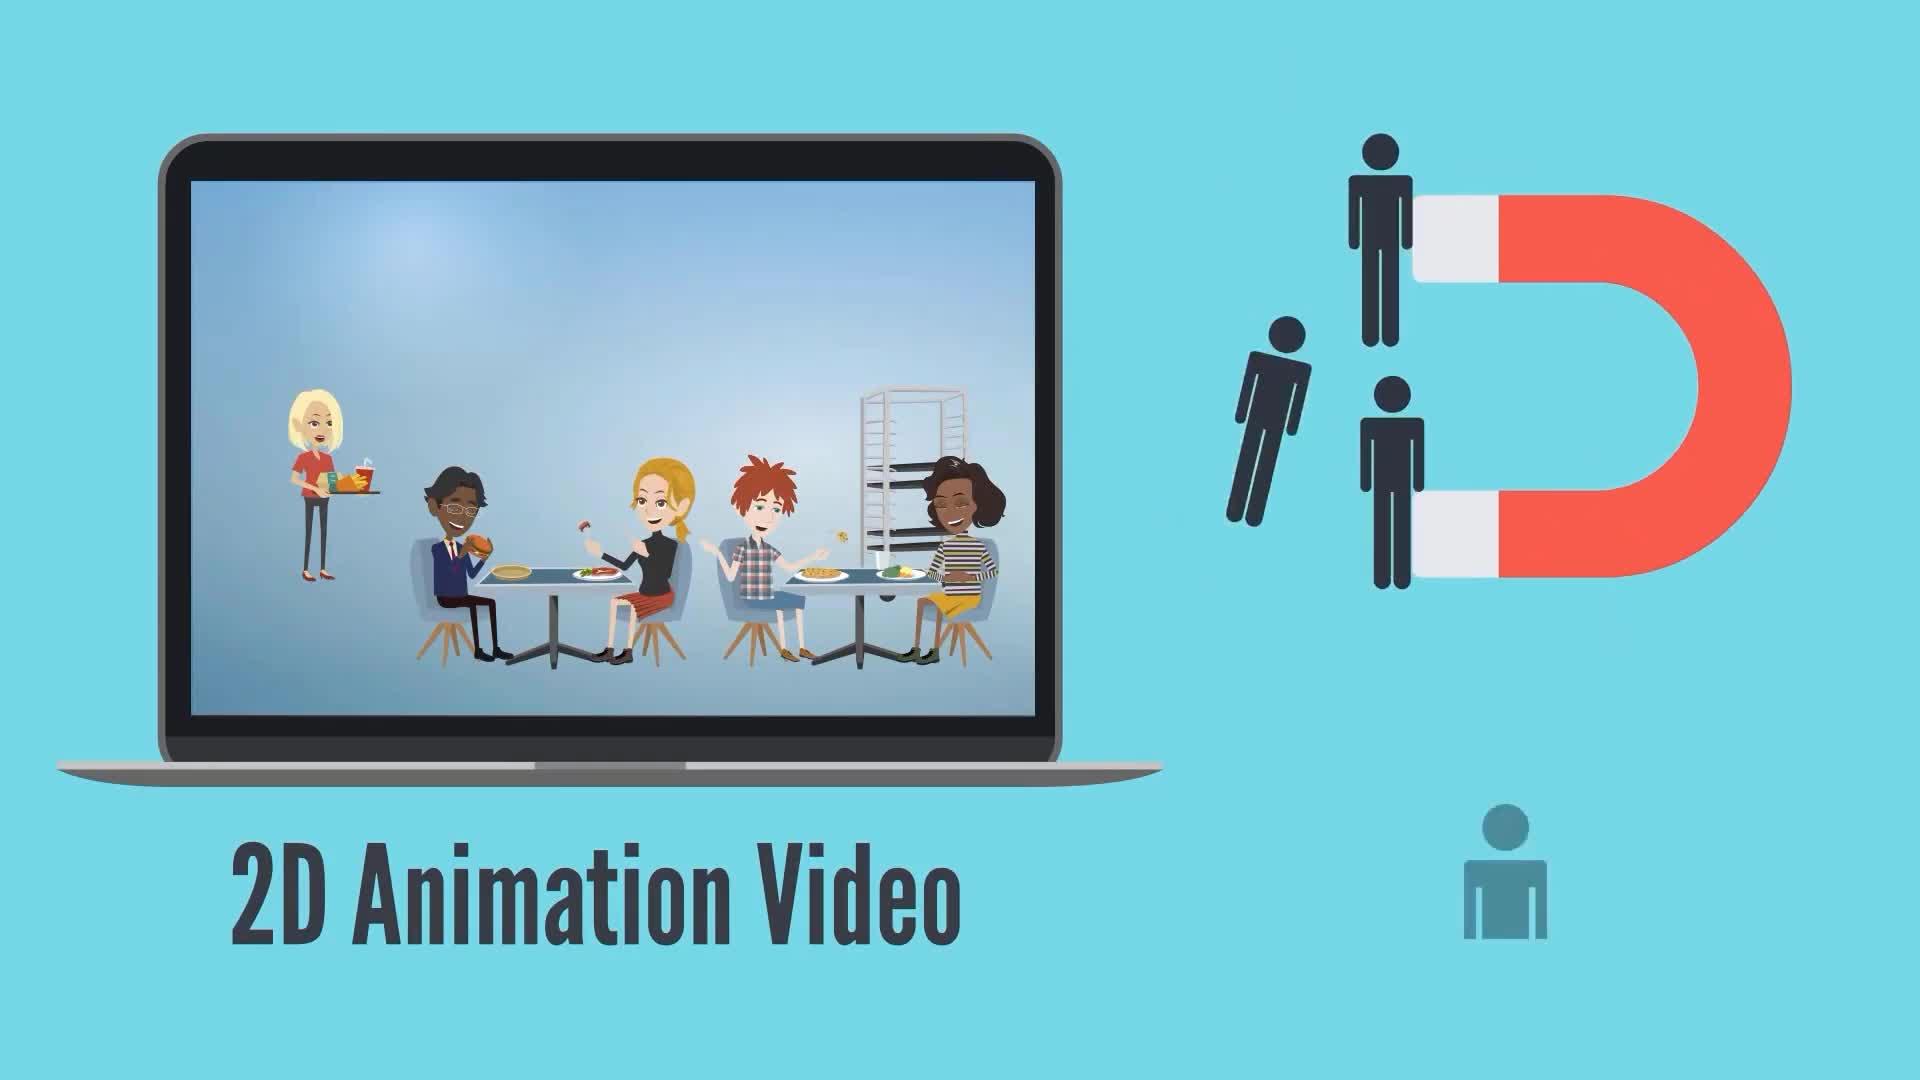 professional-video-animation-freelancer-image-258231